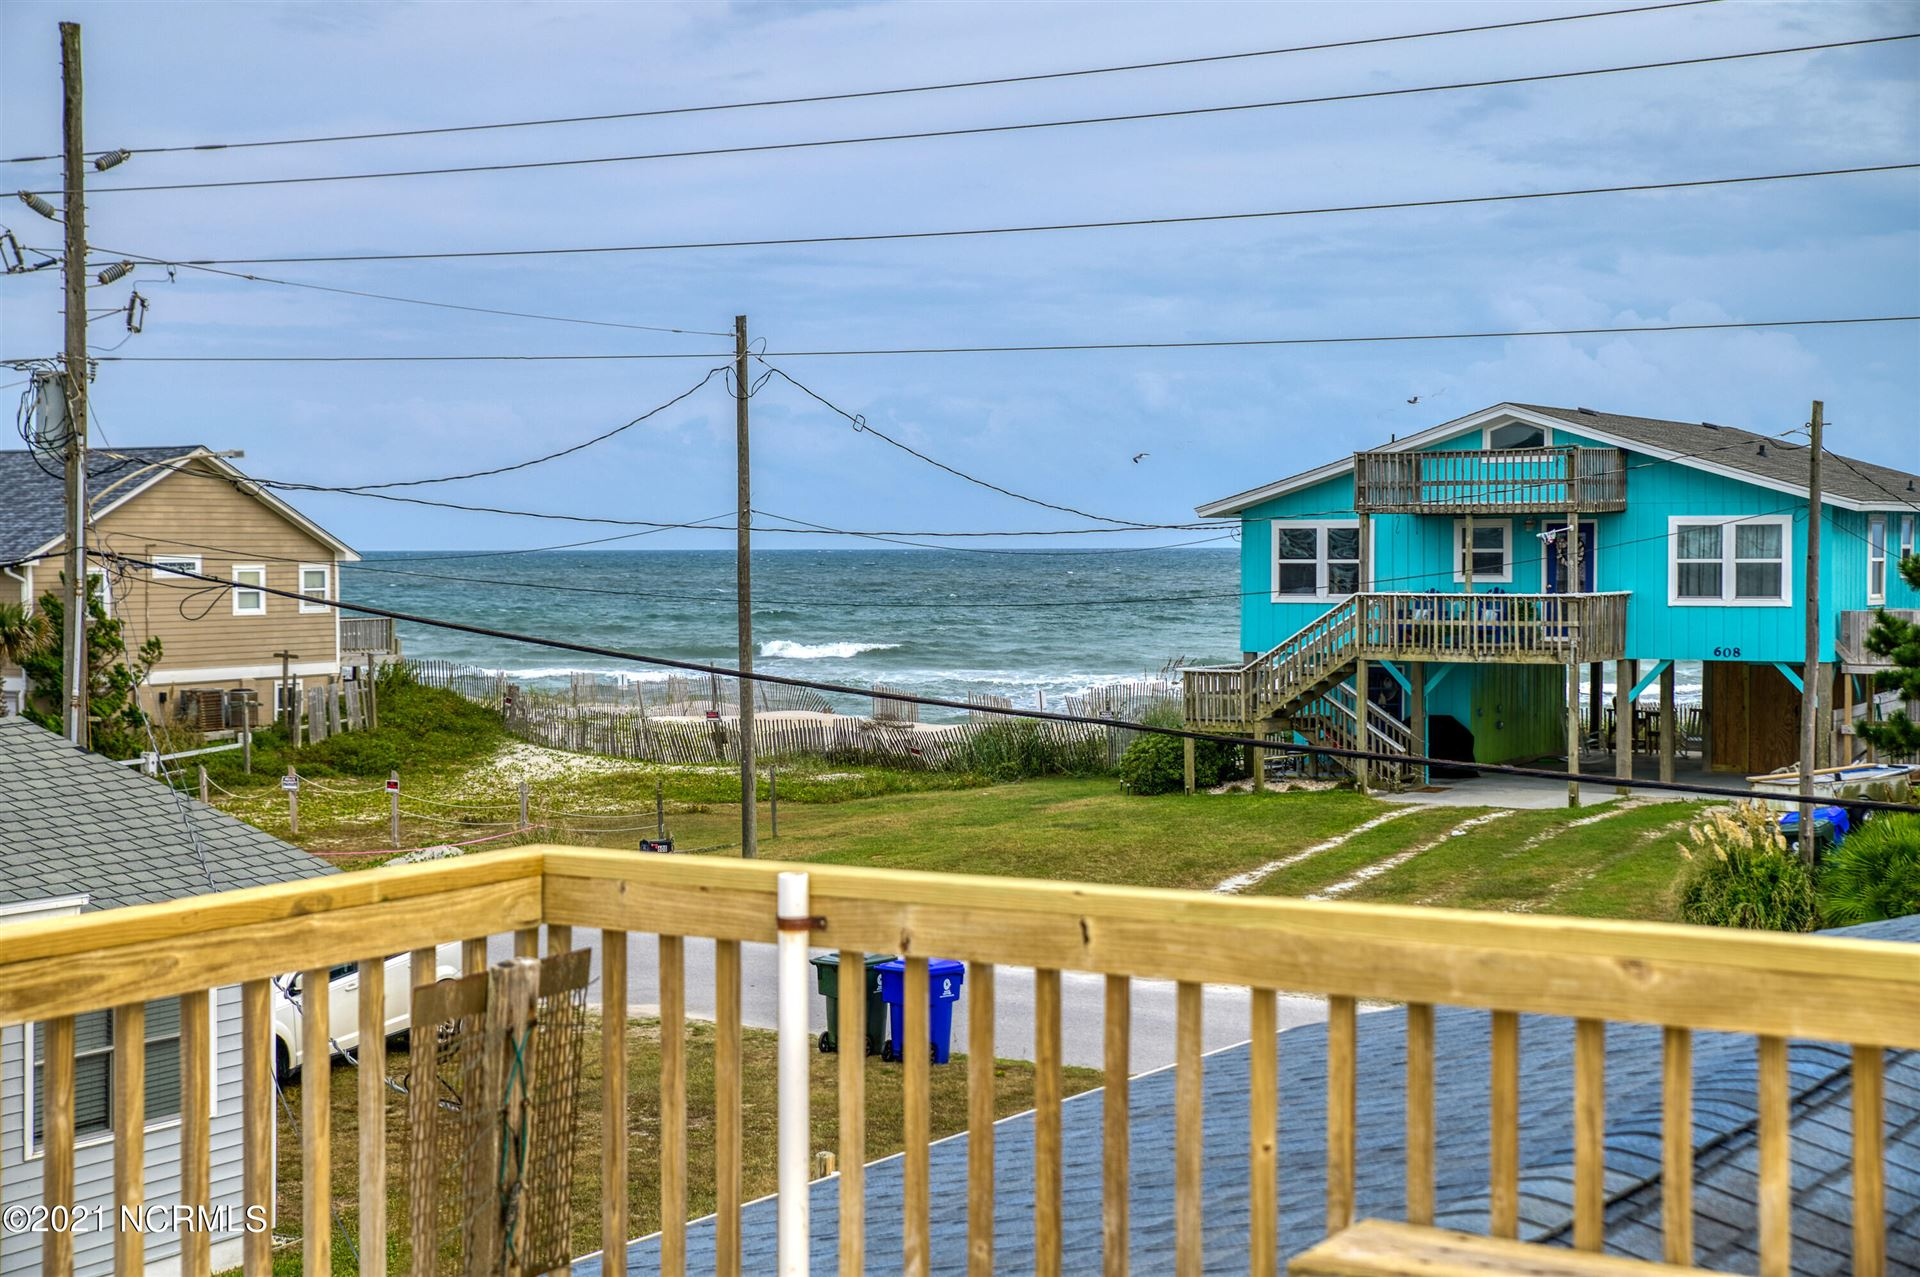 Photo of 605 N Shore Drive, Surf City, NC 28445 (MLS # 100291888)